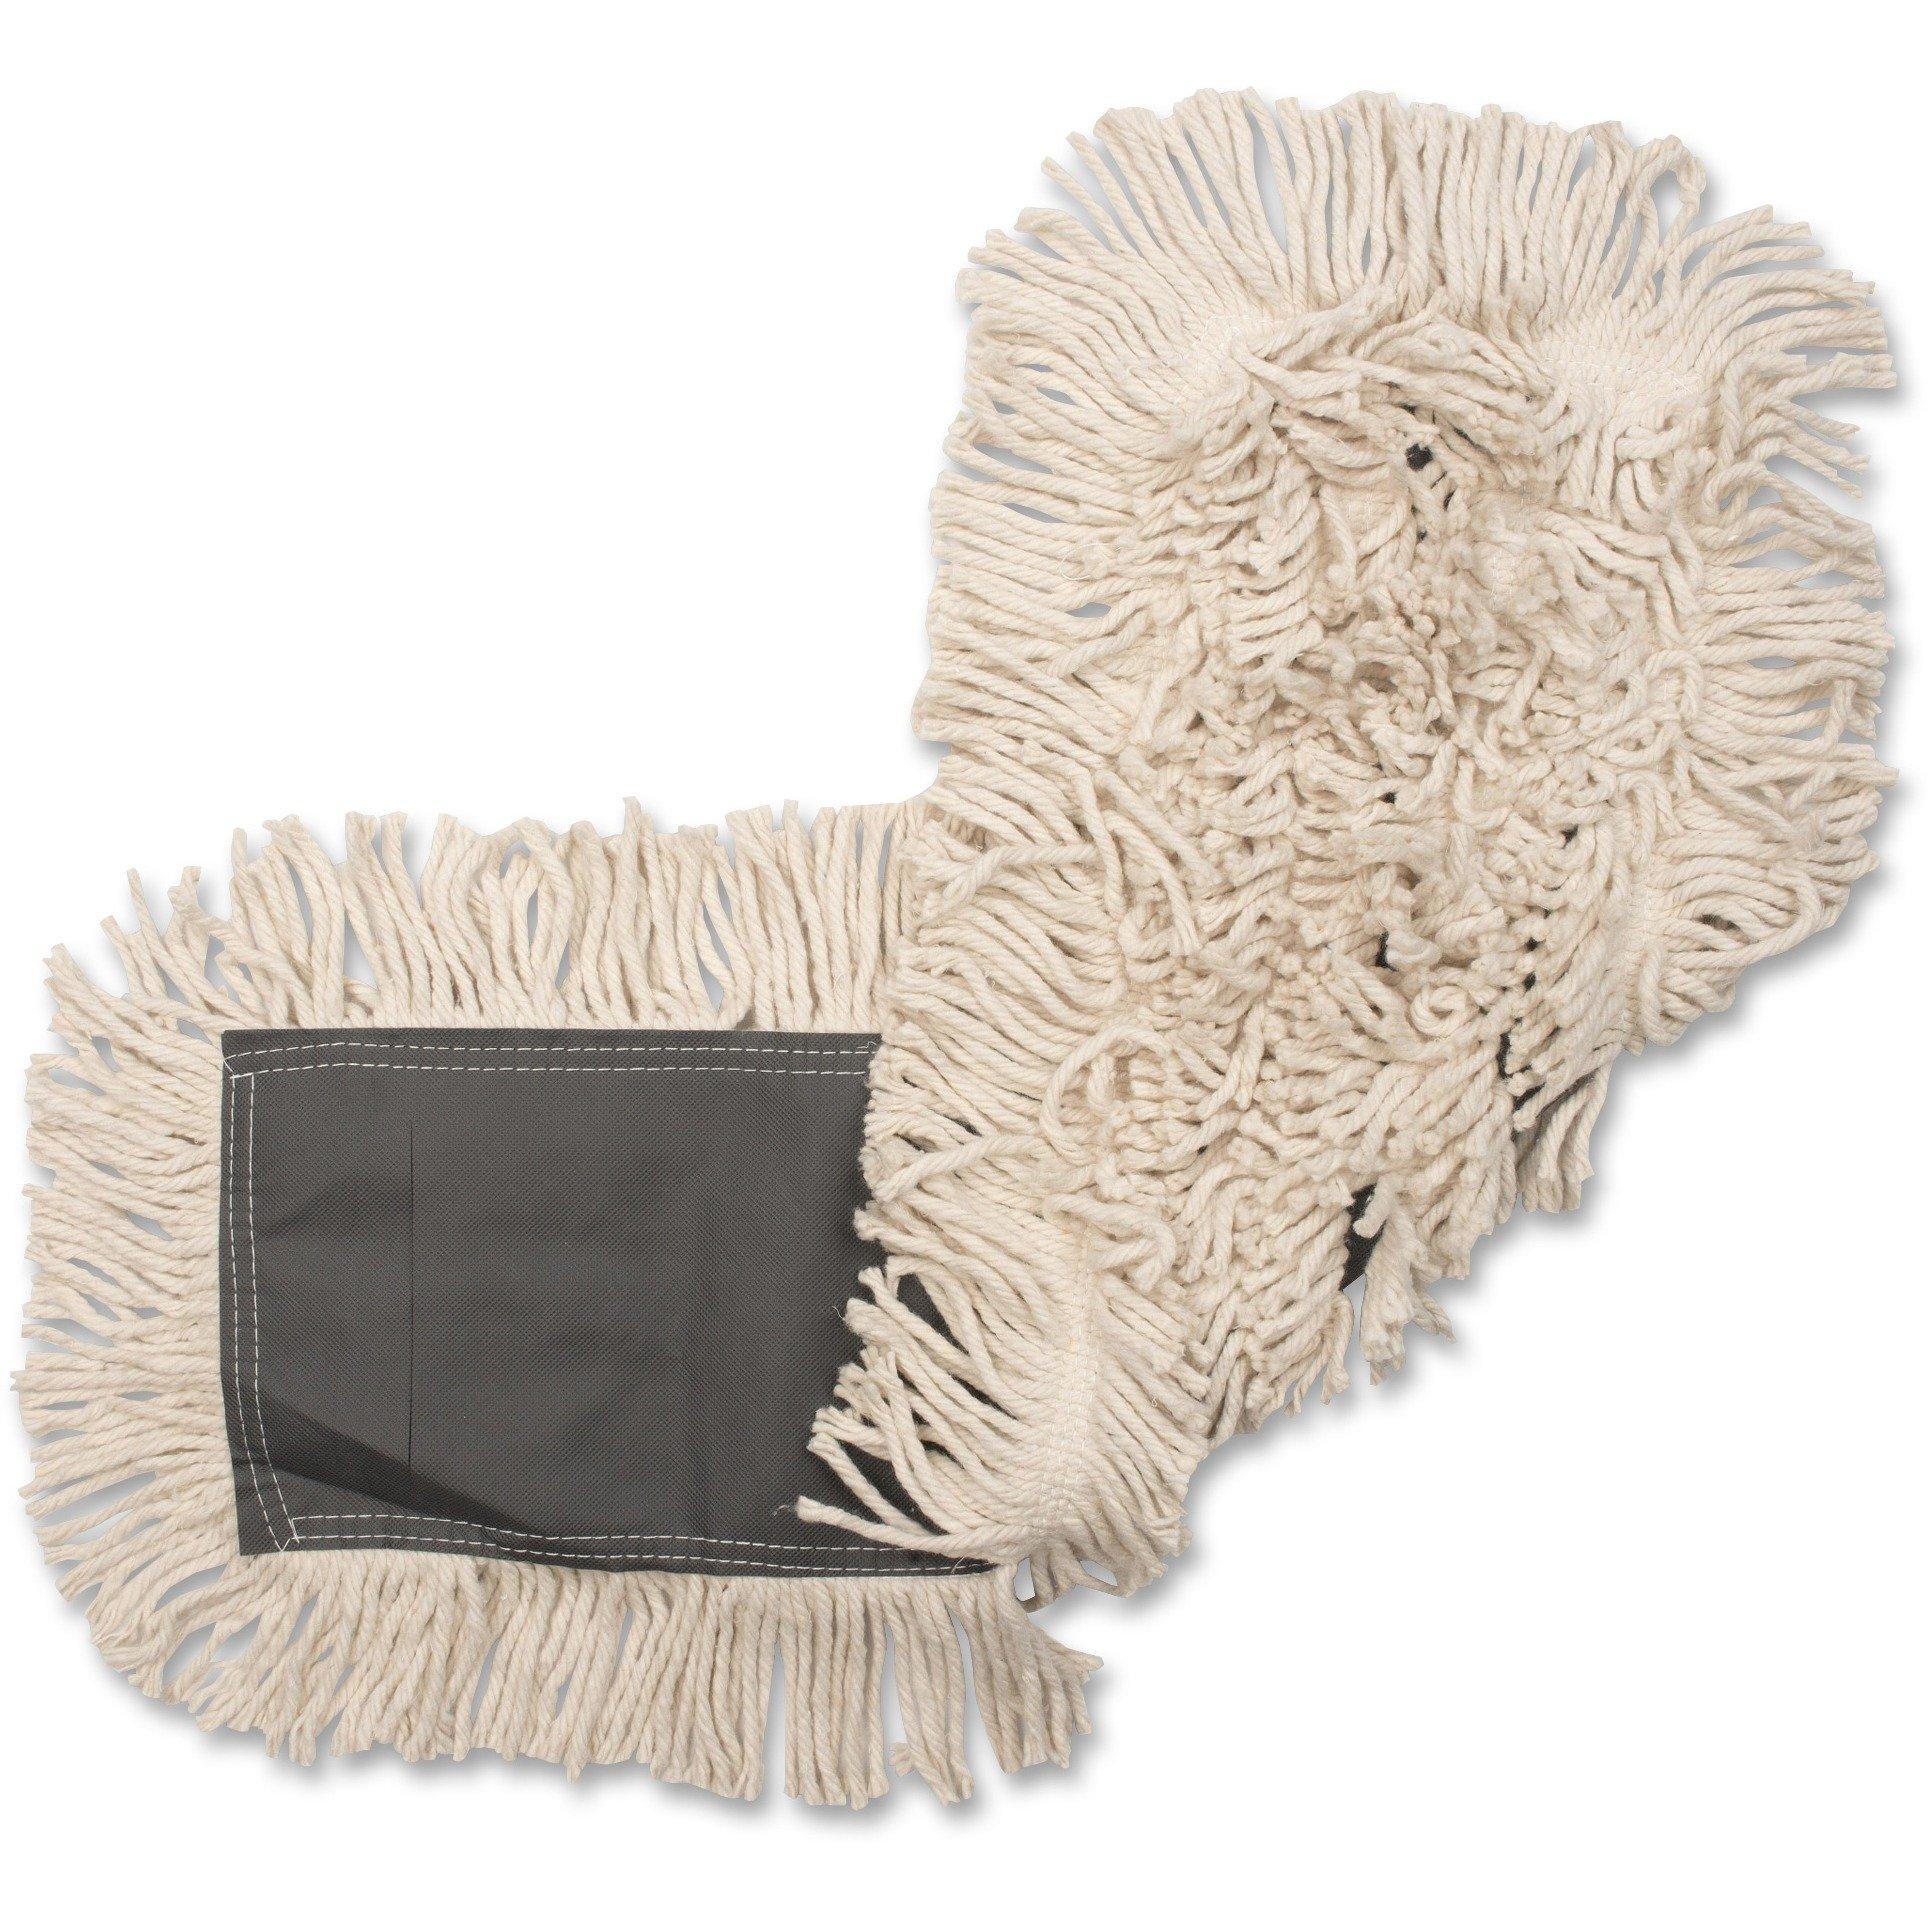 Genuine Joe GJO00185CT Disposable Cotton Dustmop, 18''X25'', 12Ea/Ct, Natural (Pack of 12)